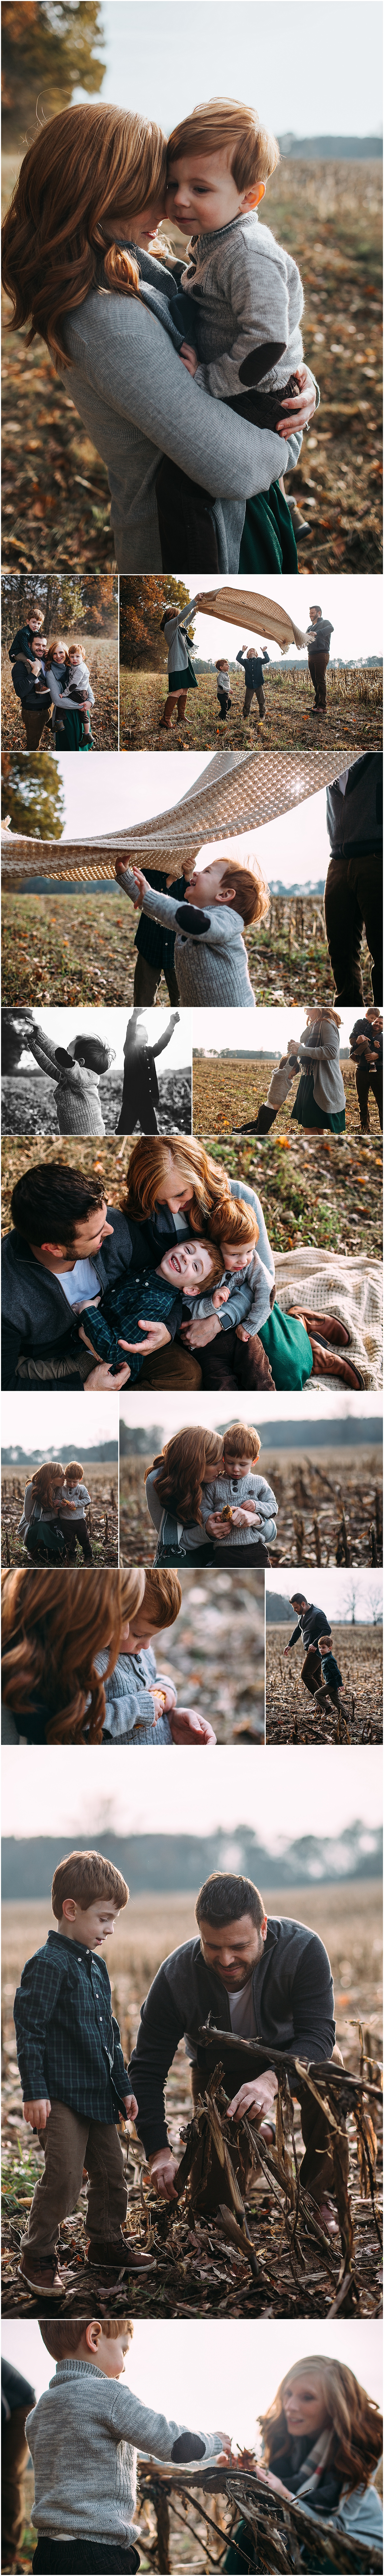 fall family photo session in kalamazoo michigan